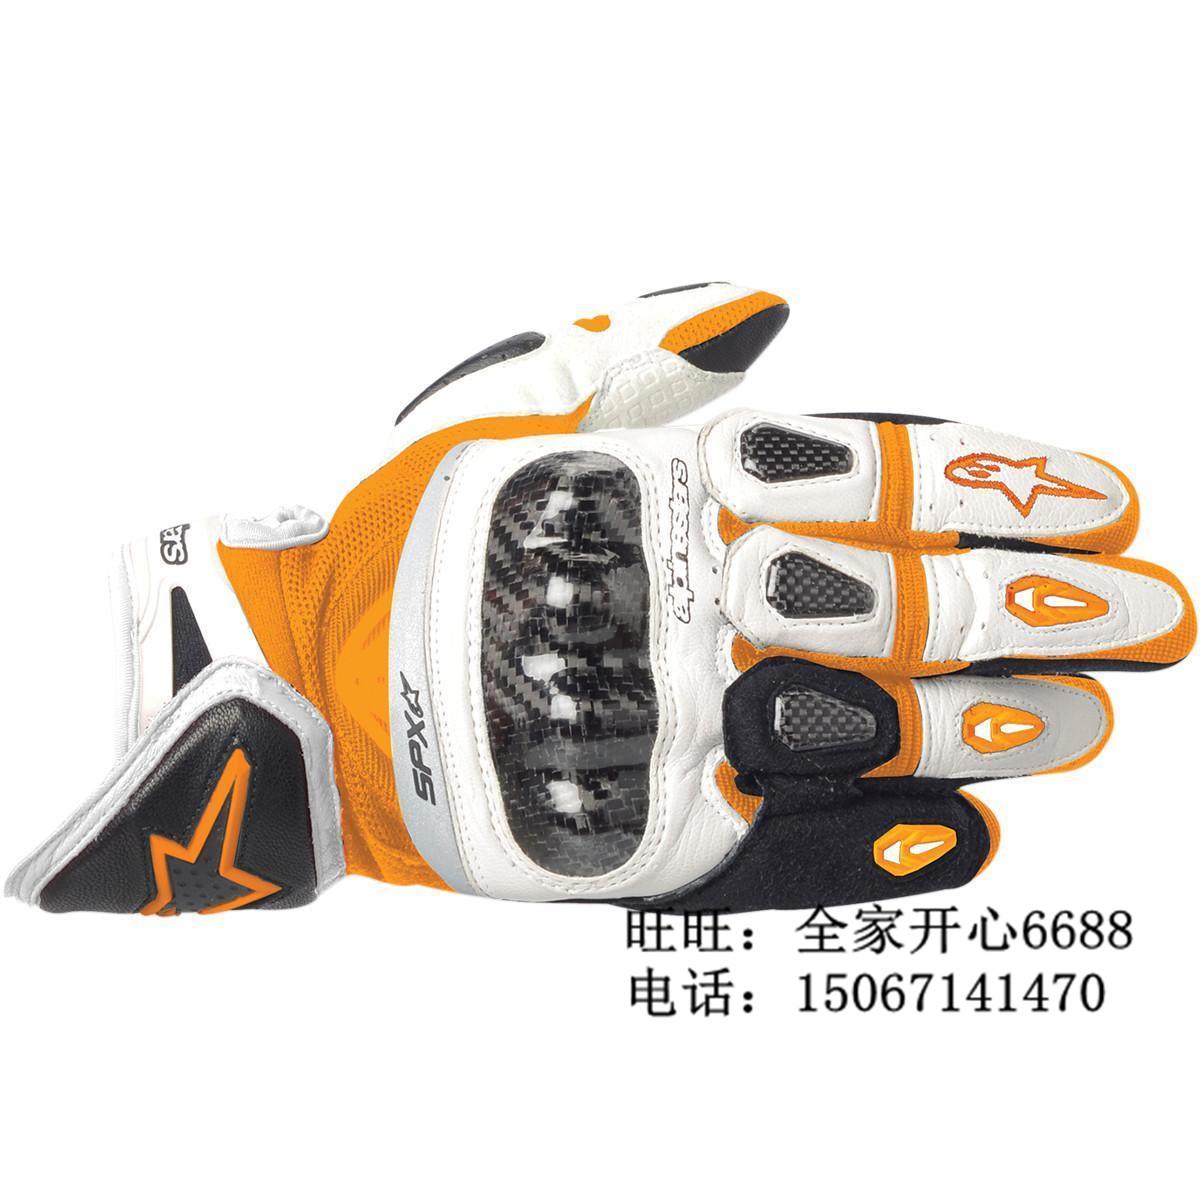 Перчатки для туризма и кемпинга Dragon forest Alpinestars Dragon forest